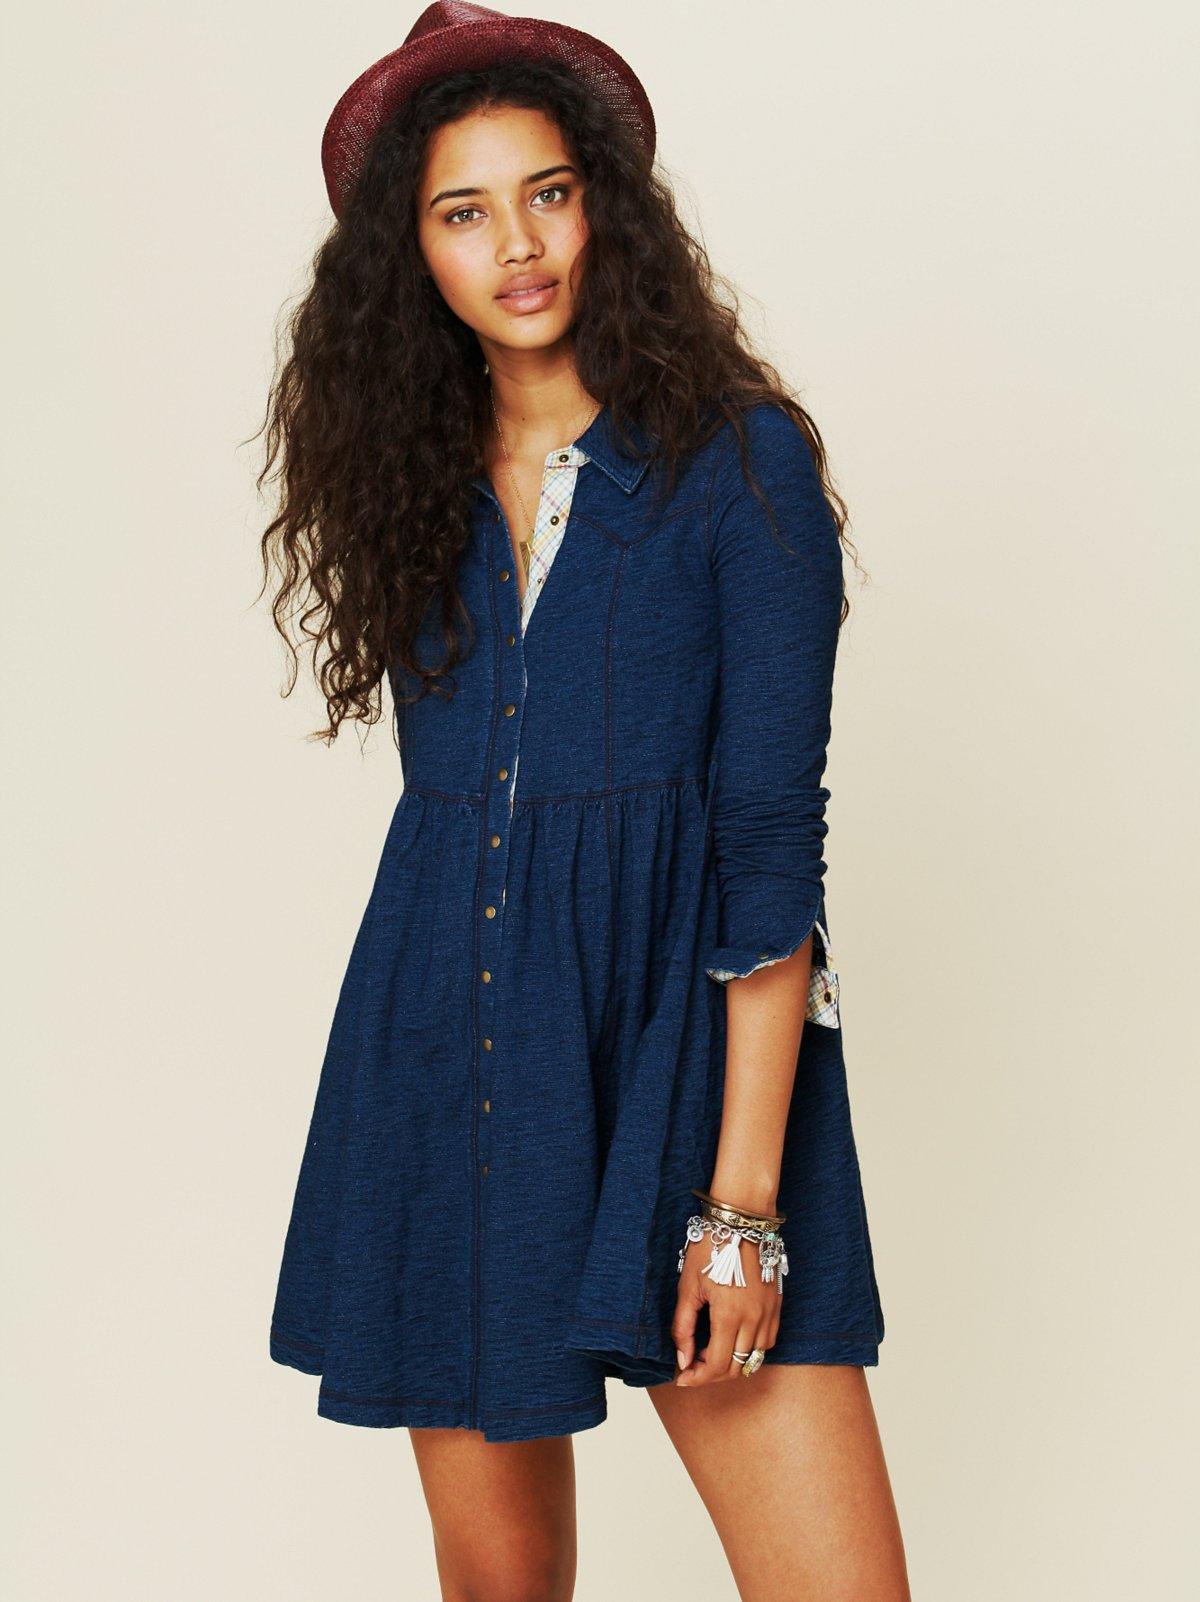 Denim Knit Shirt Dress